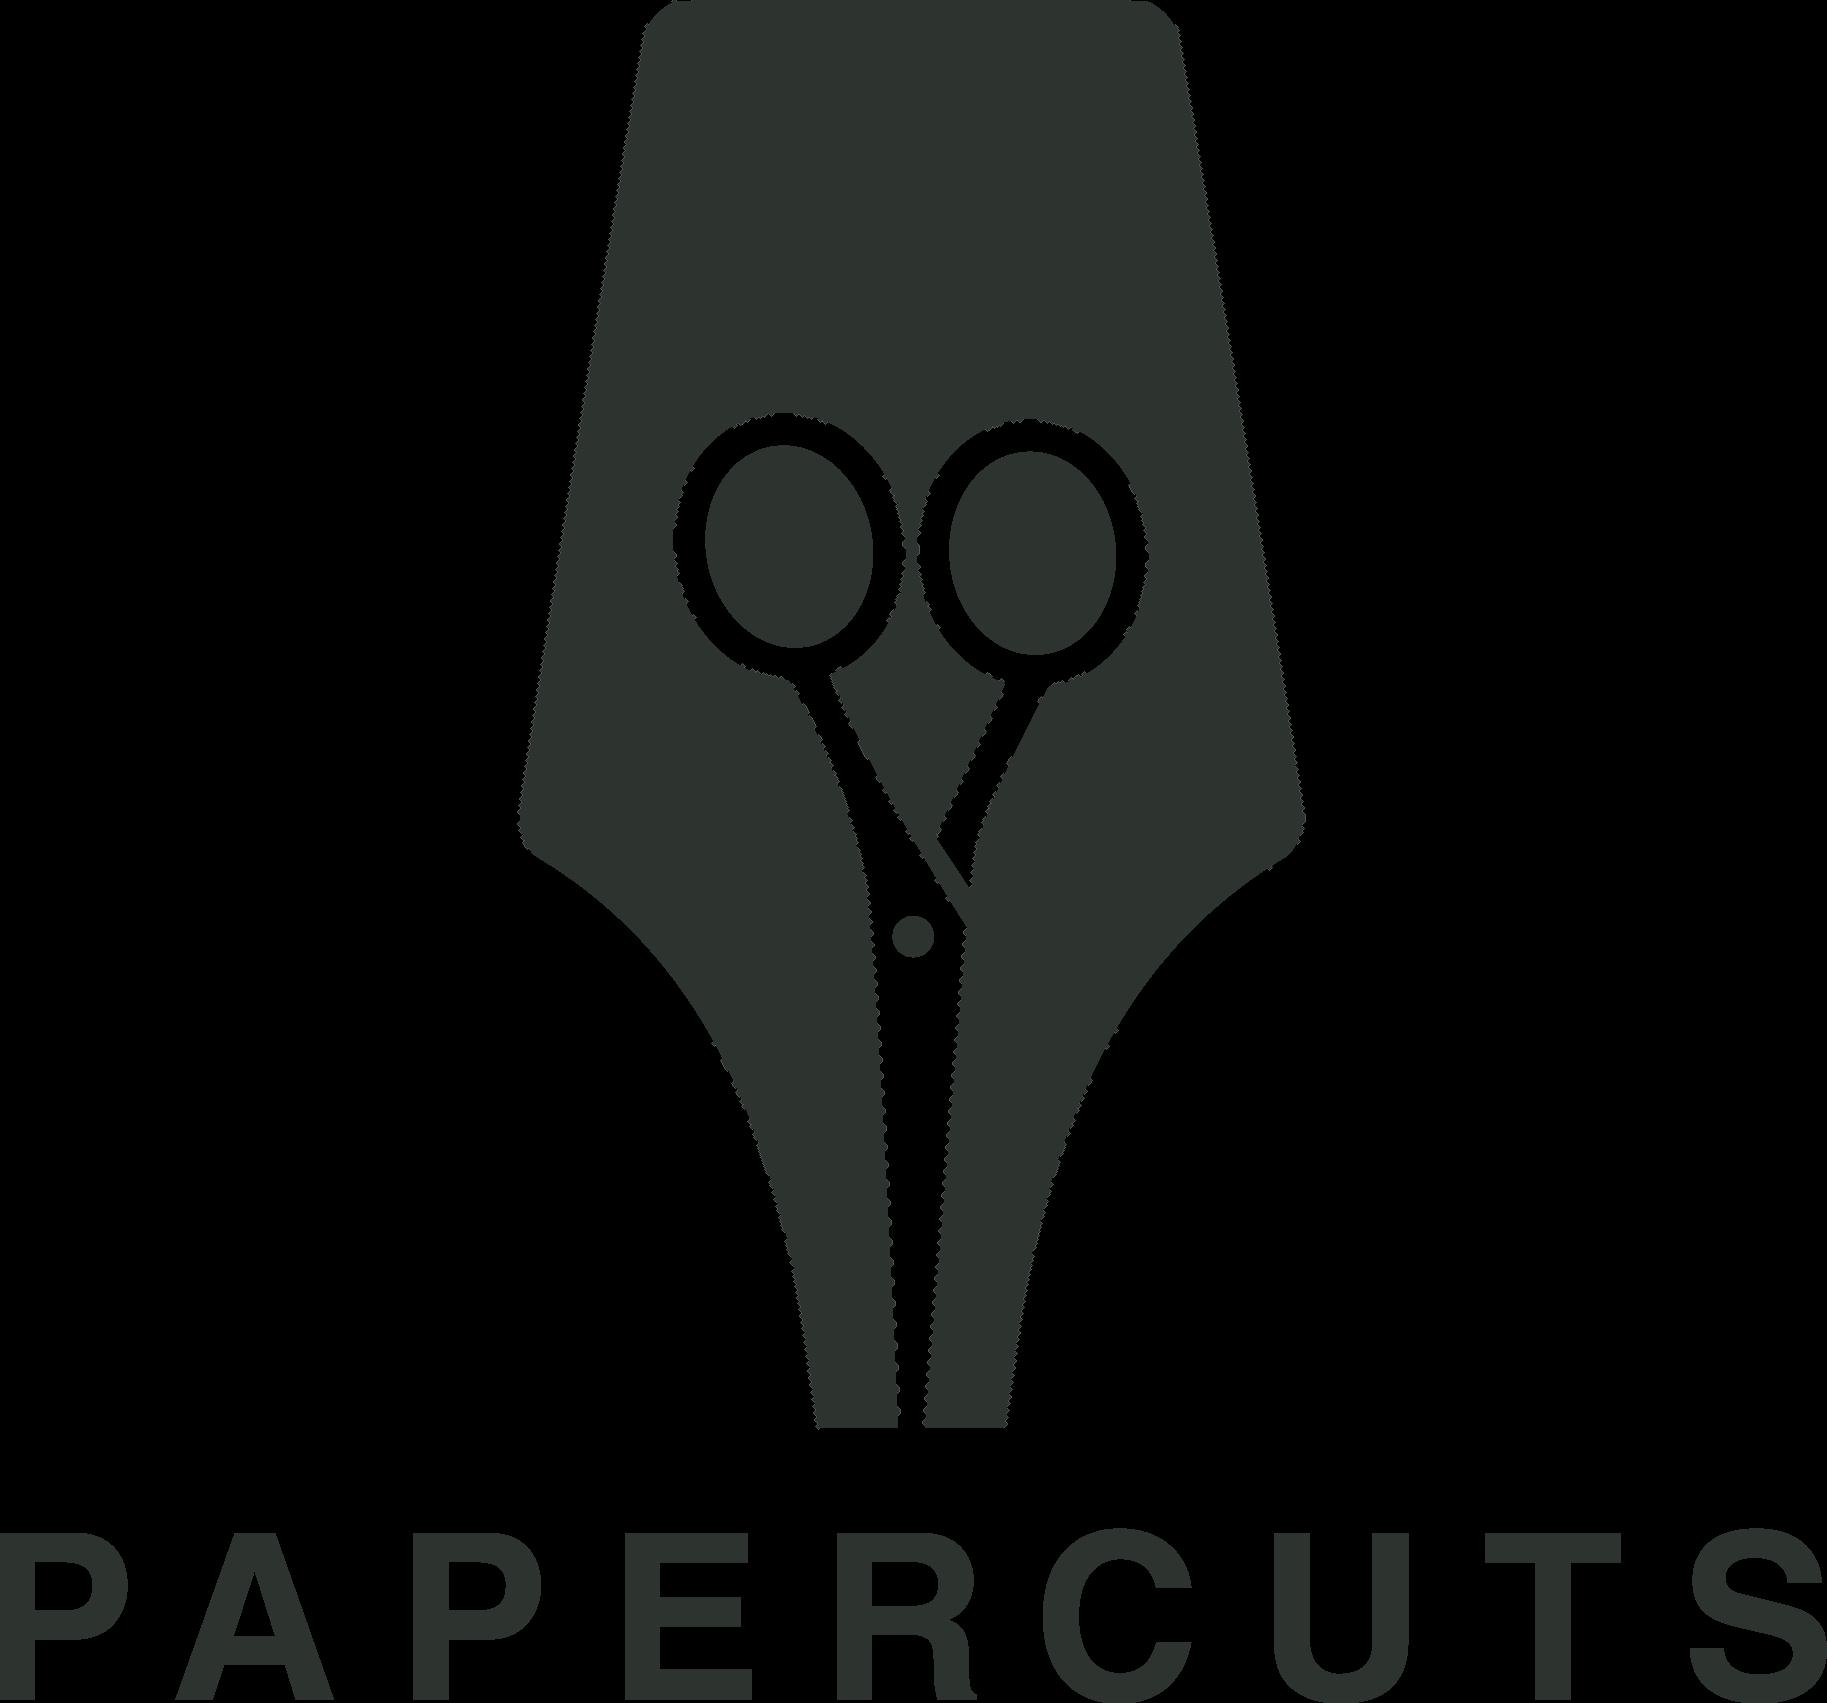 papercuts_dark_on_white.png